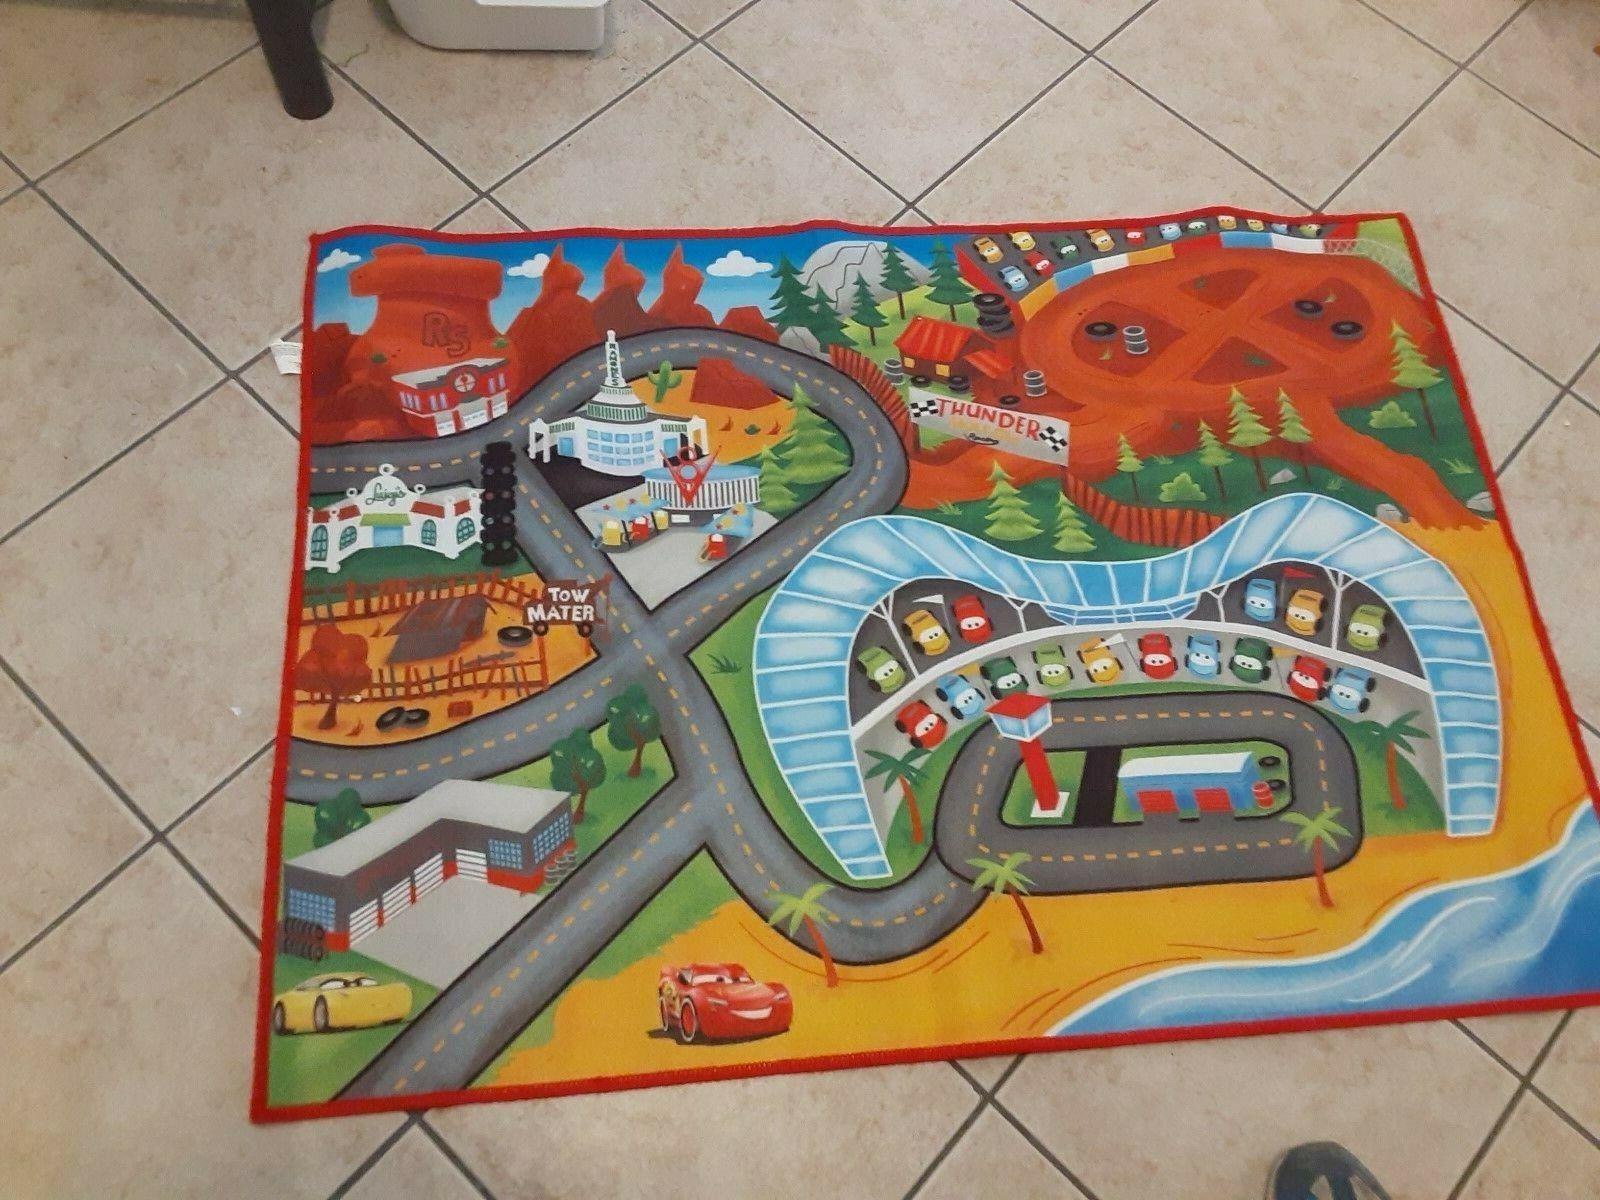 Pixar Toy Story 4 Game Rug Carpet 44 L x 31.5 W